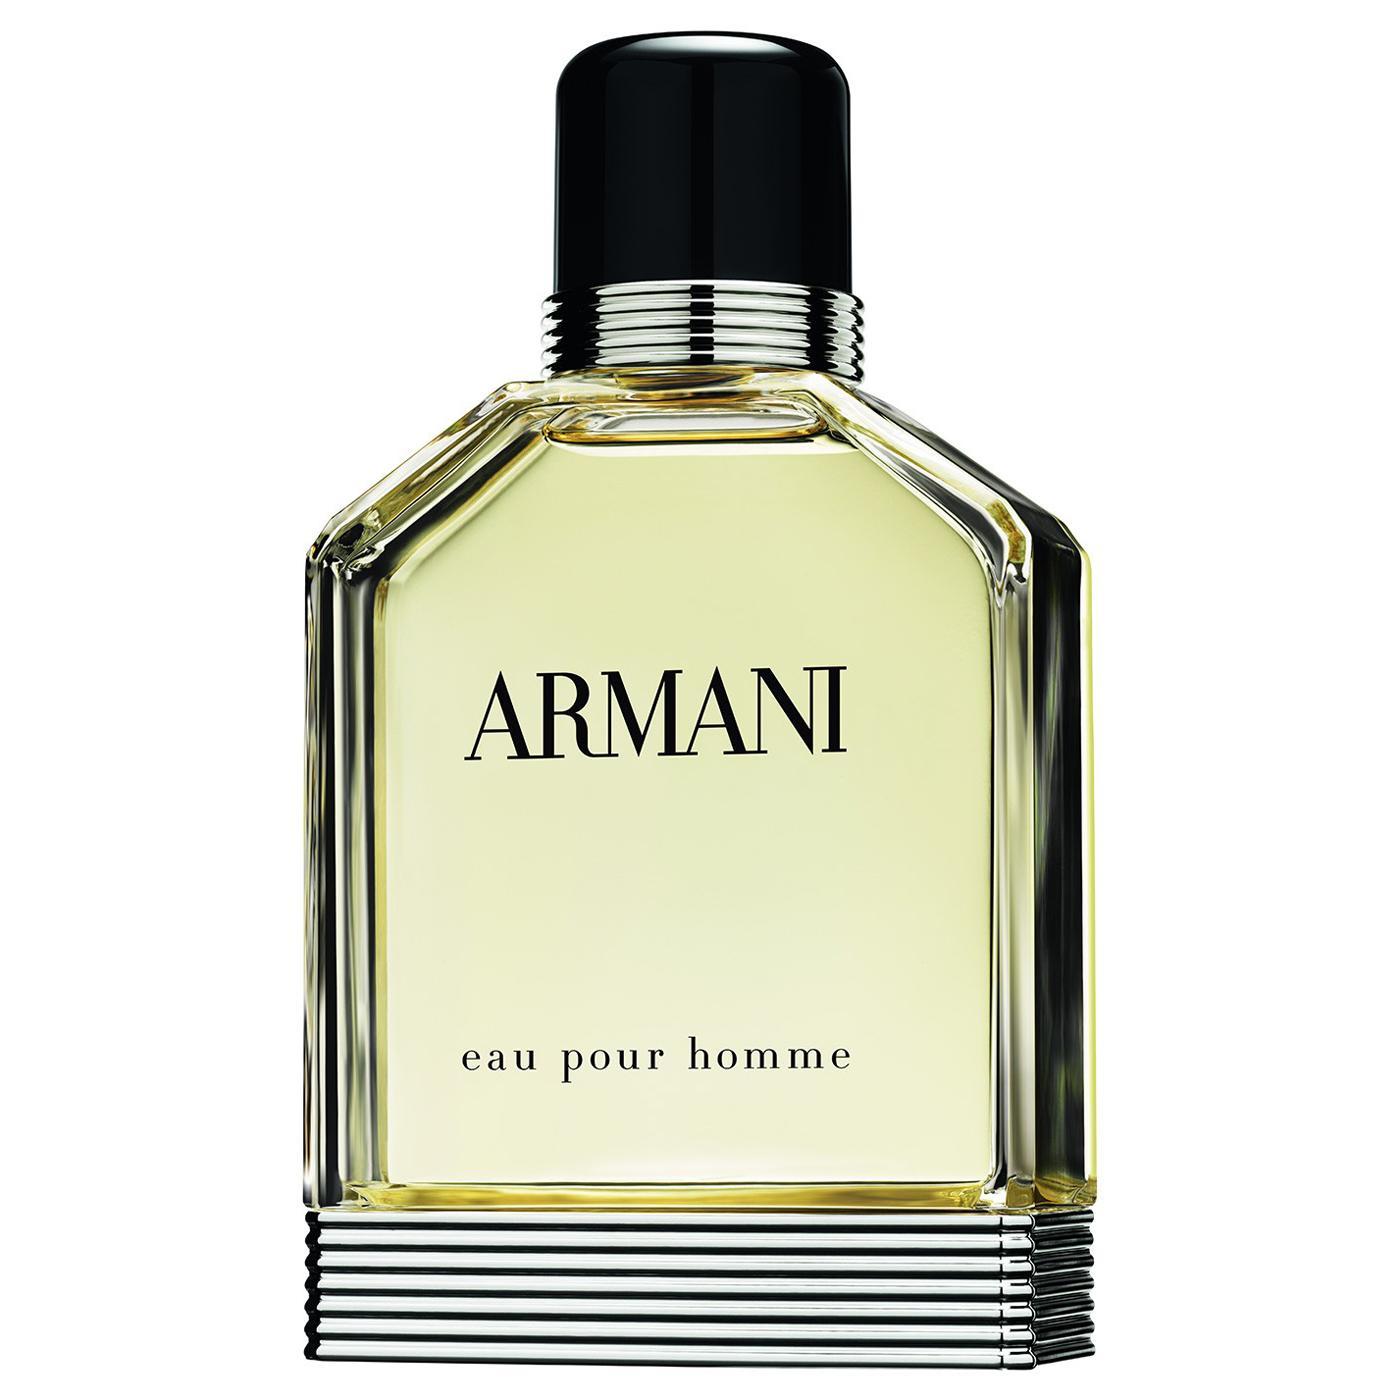 armani_pourhomme